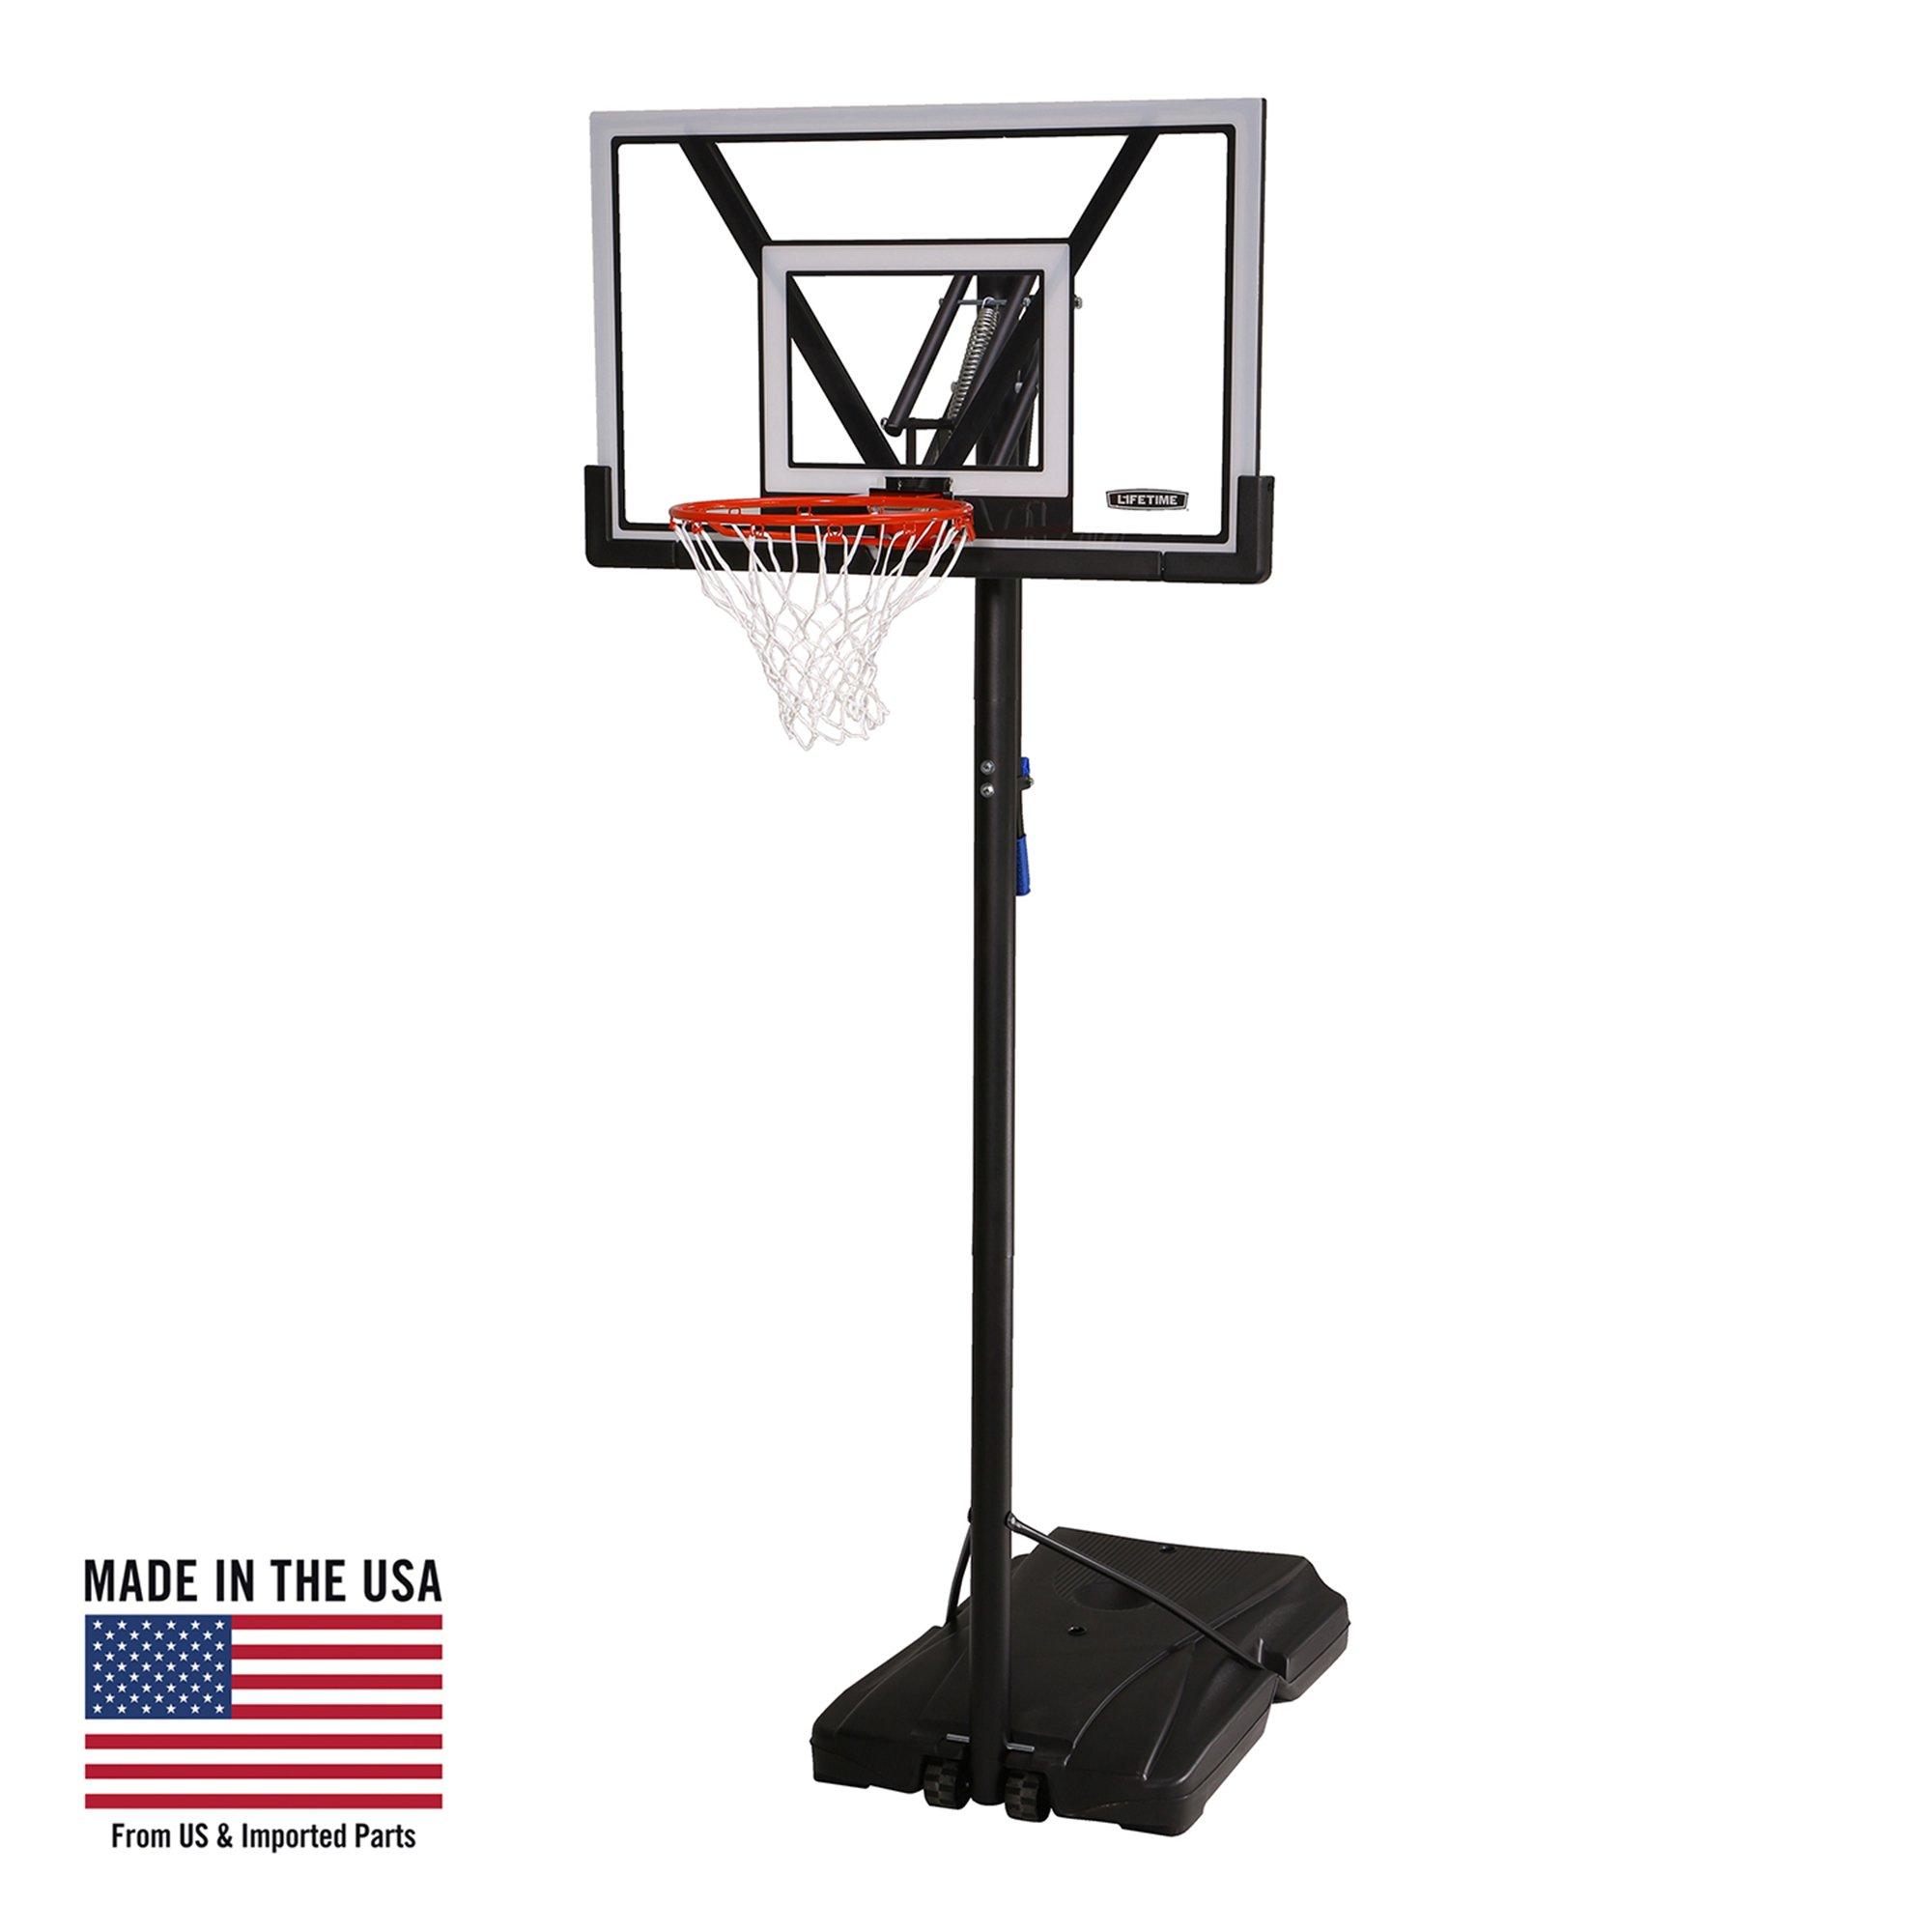 Lifetime 90585 Portable Basketball System, 48 Inch Polycarbonate Shatterproof Backboard - Gray